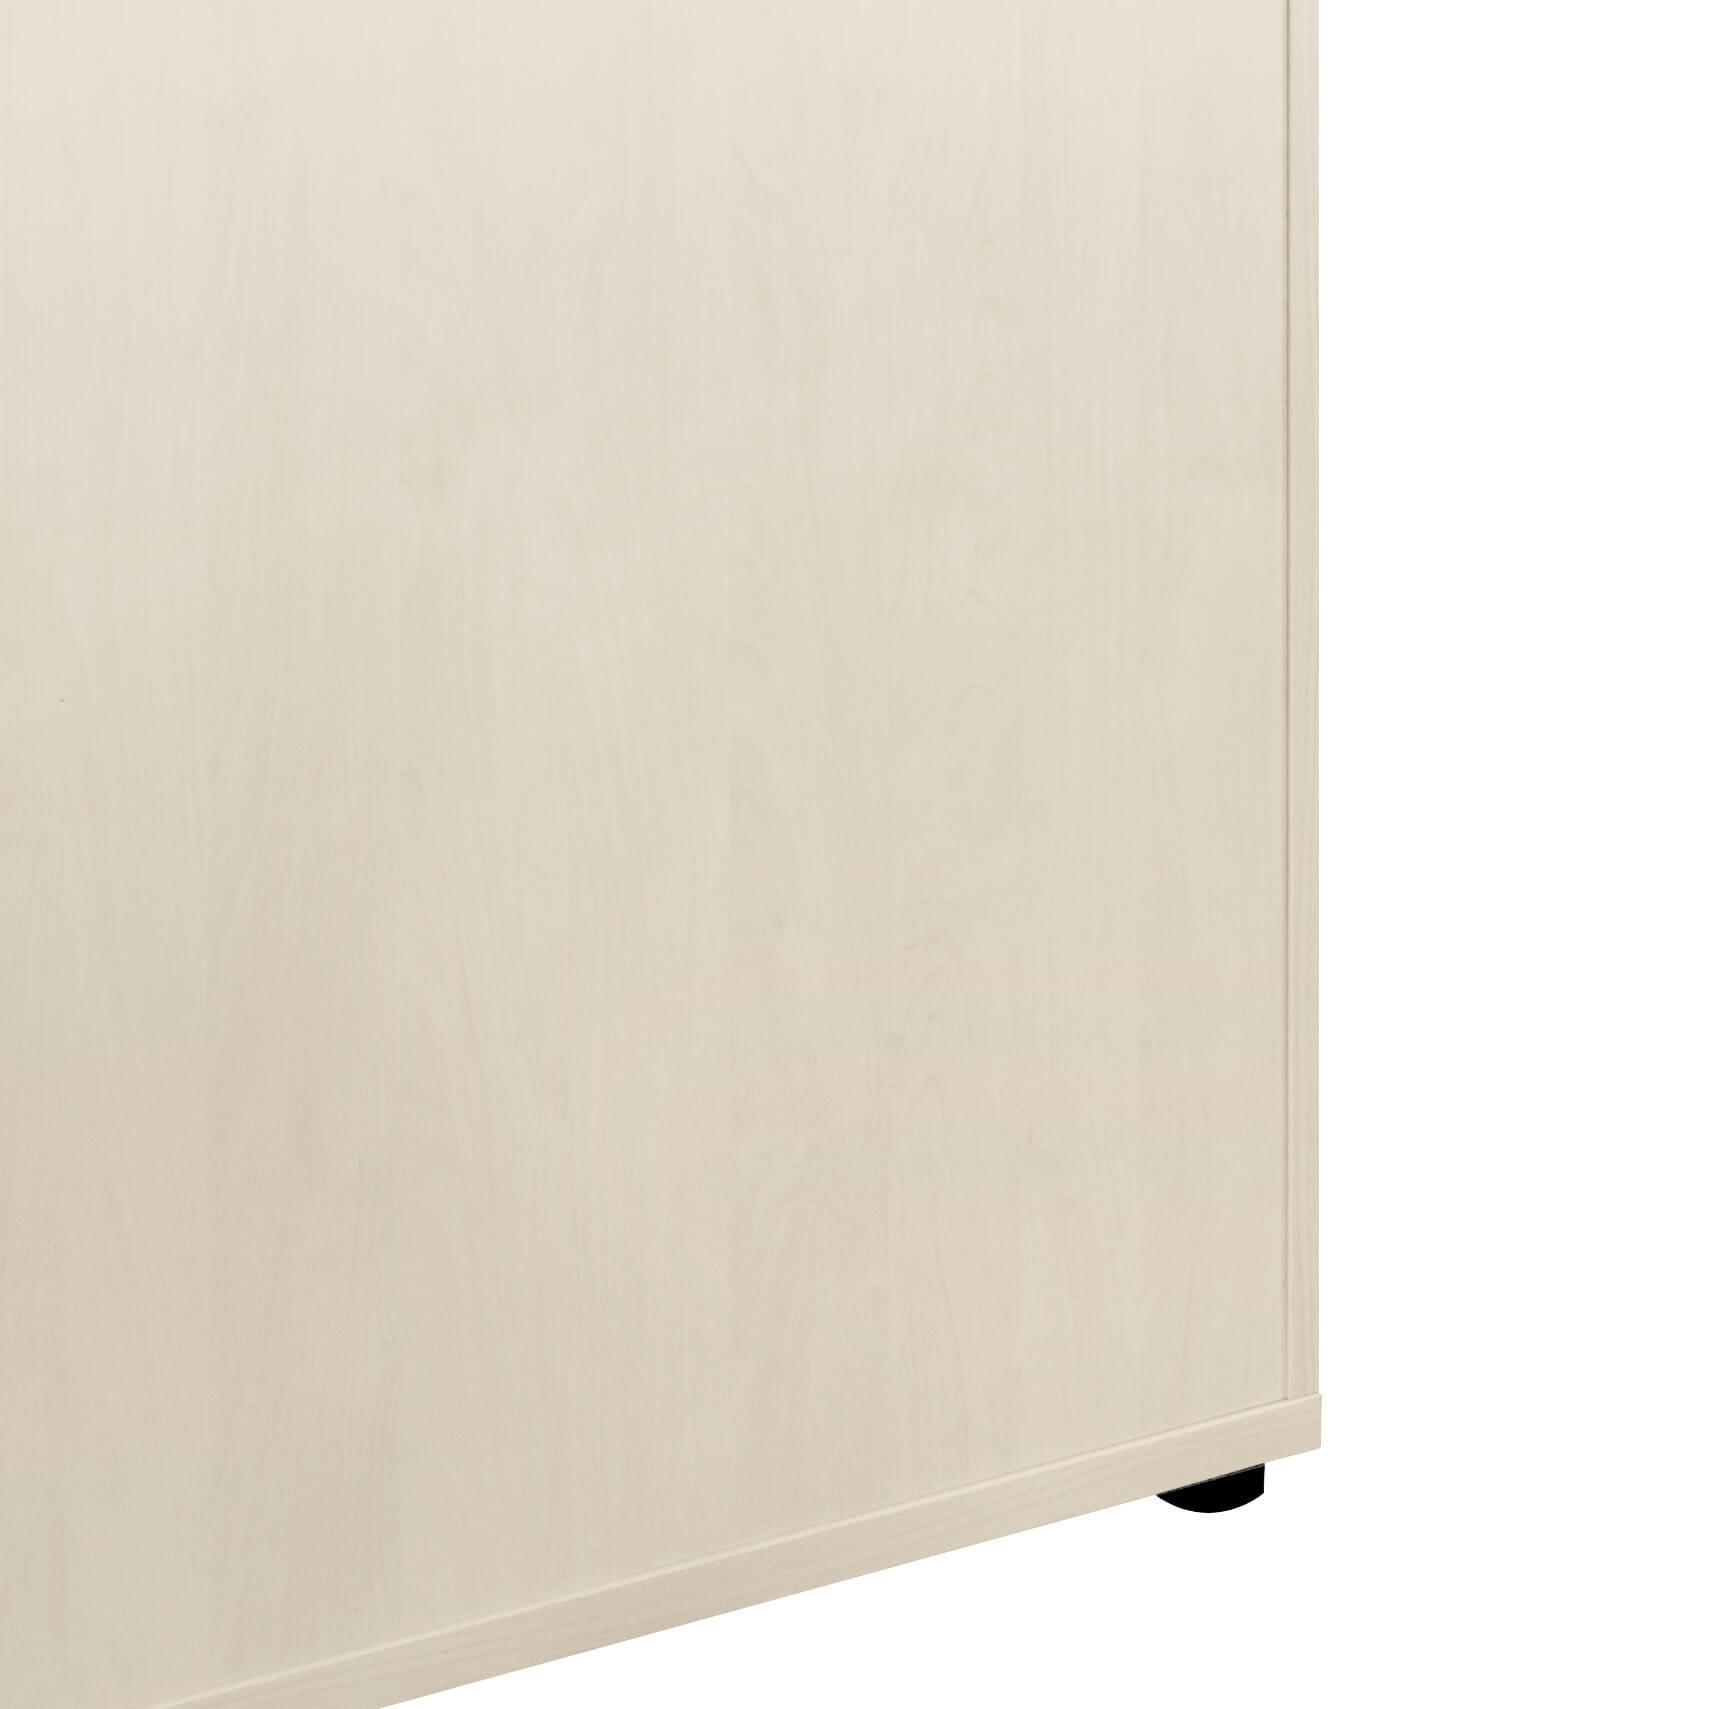 UNI Aktenschrank 1,2M abschließbar 3 OH Weiß-Ahorn Büroschrank Schiebetürenschrank